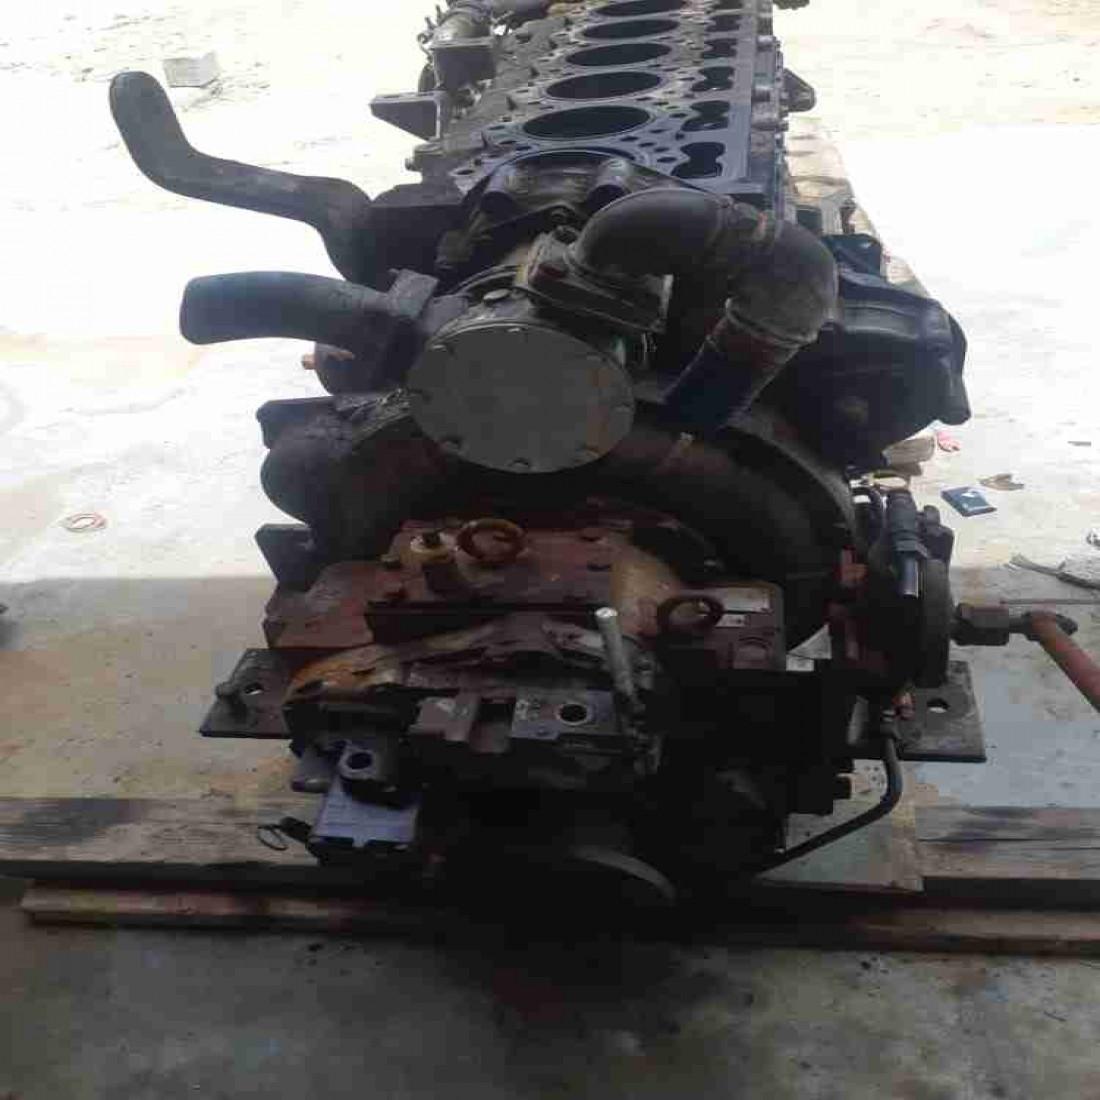 فروش موتور میتسوبیشی 640